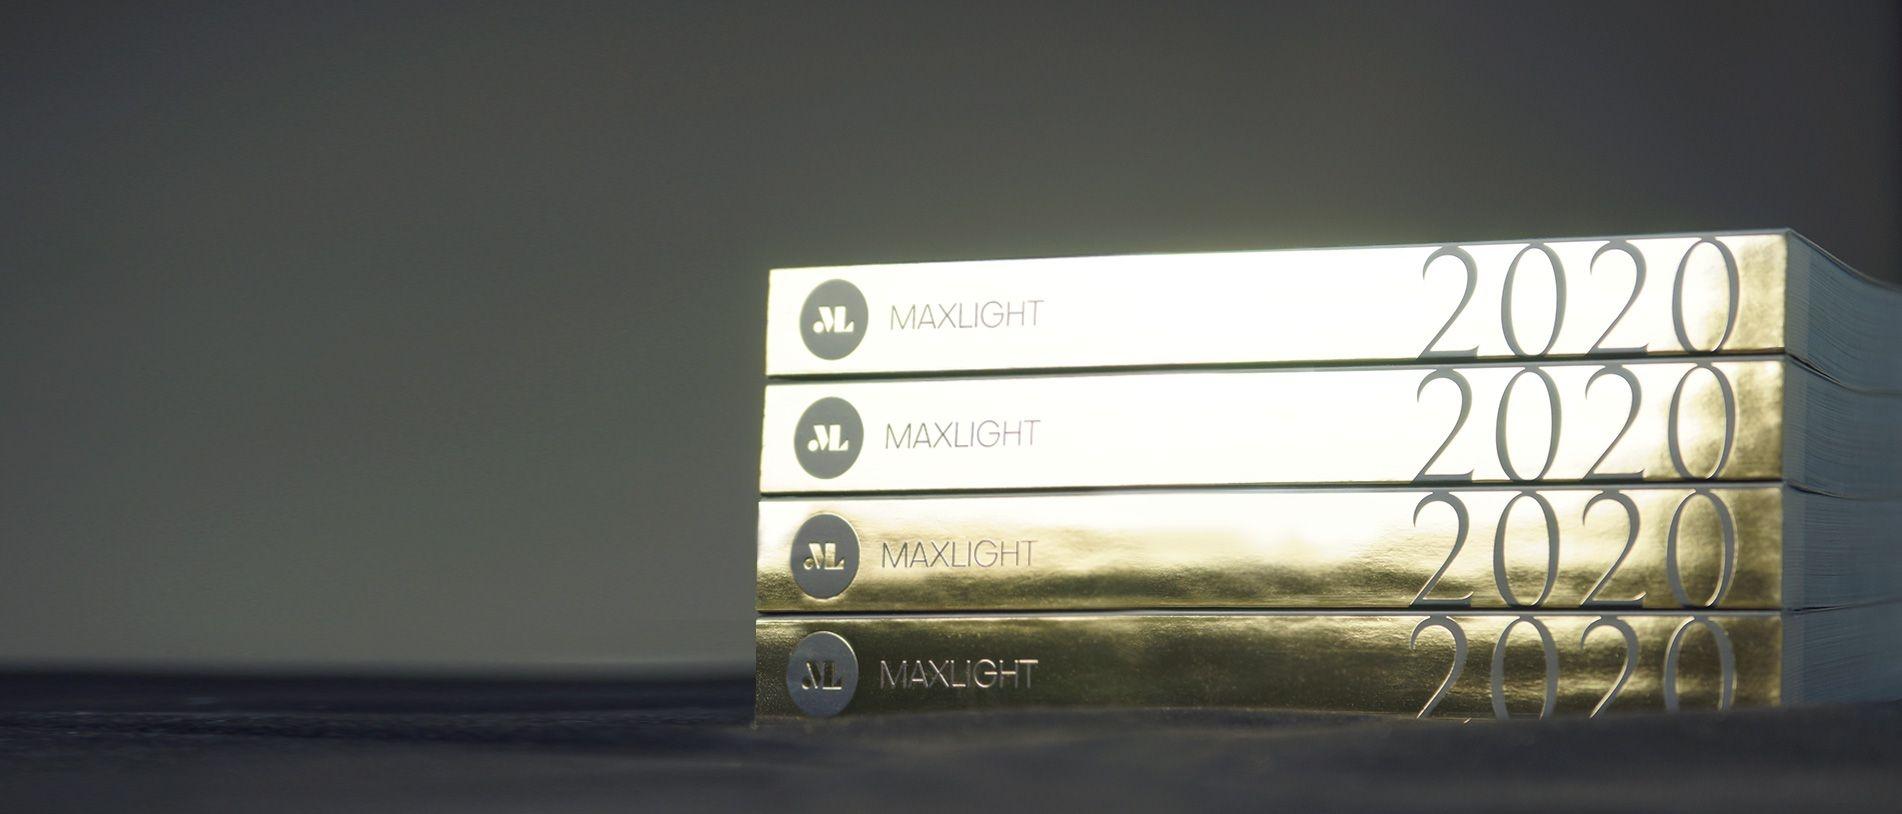 Maxlight 2020